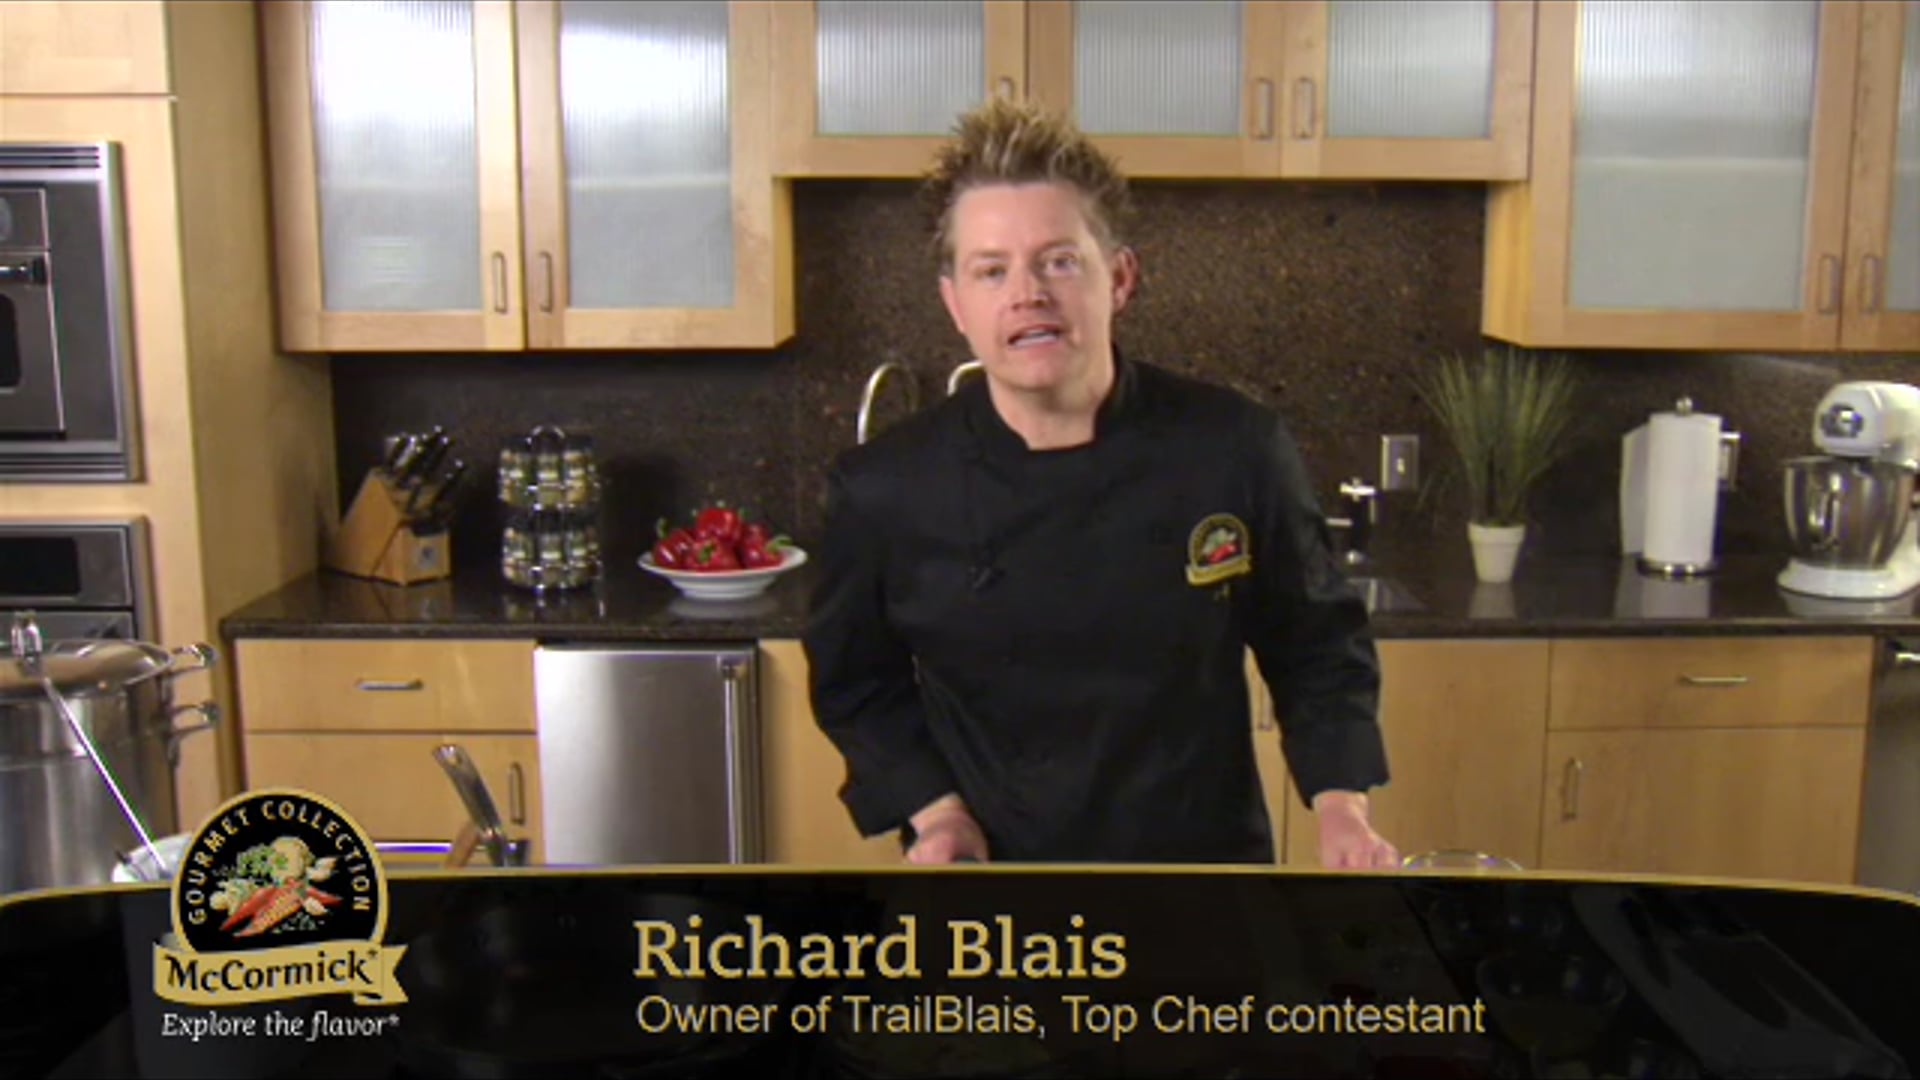 McCormick: Richard Blais Pasta Recipe (2009) Producer, director, editor Jose A. Acosta for Studiocom.